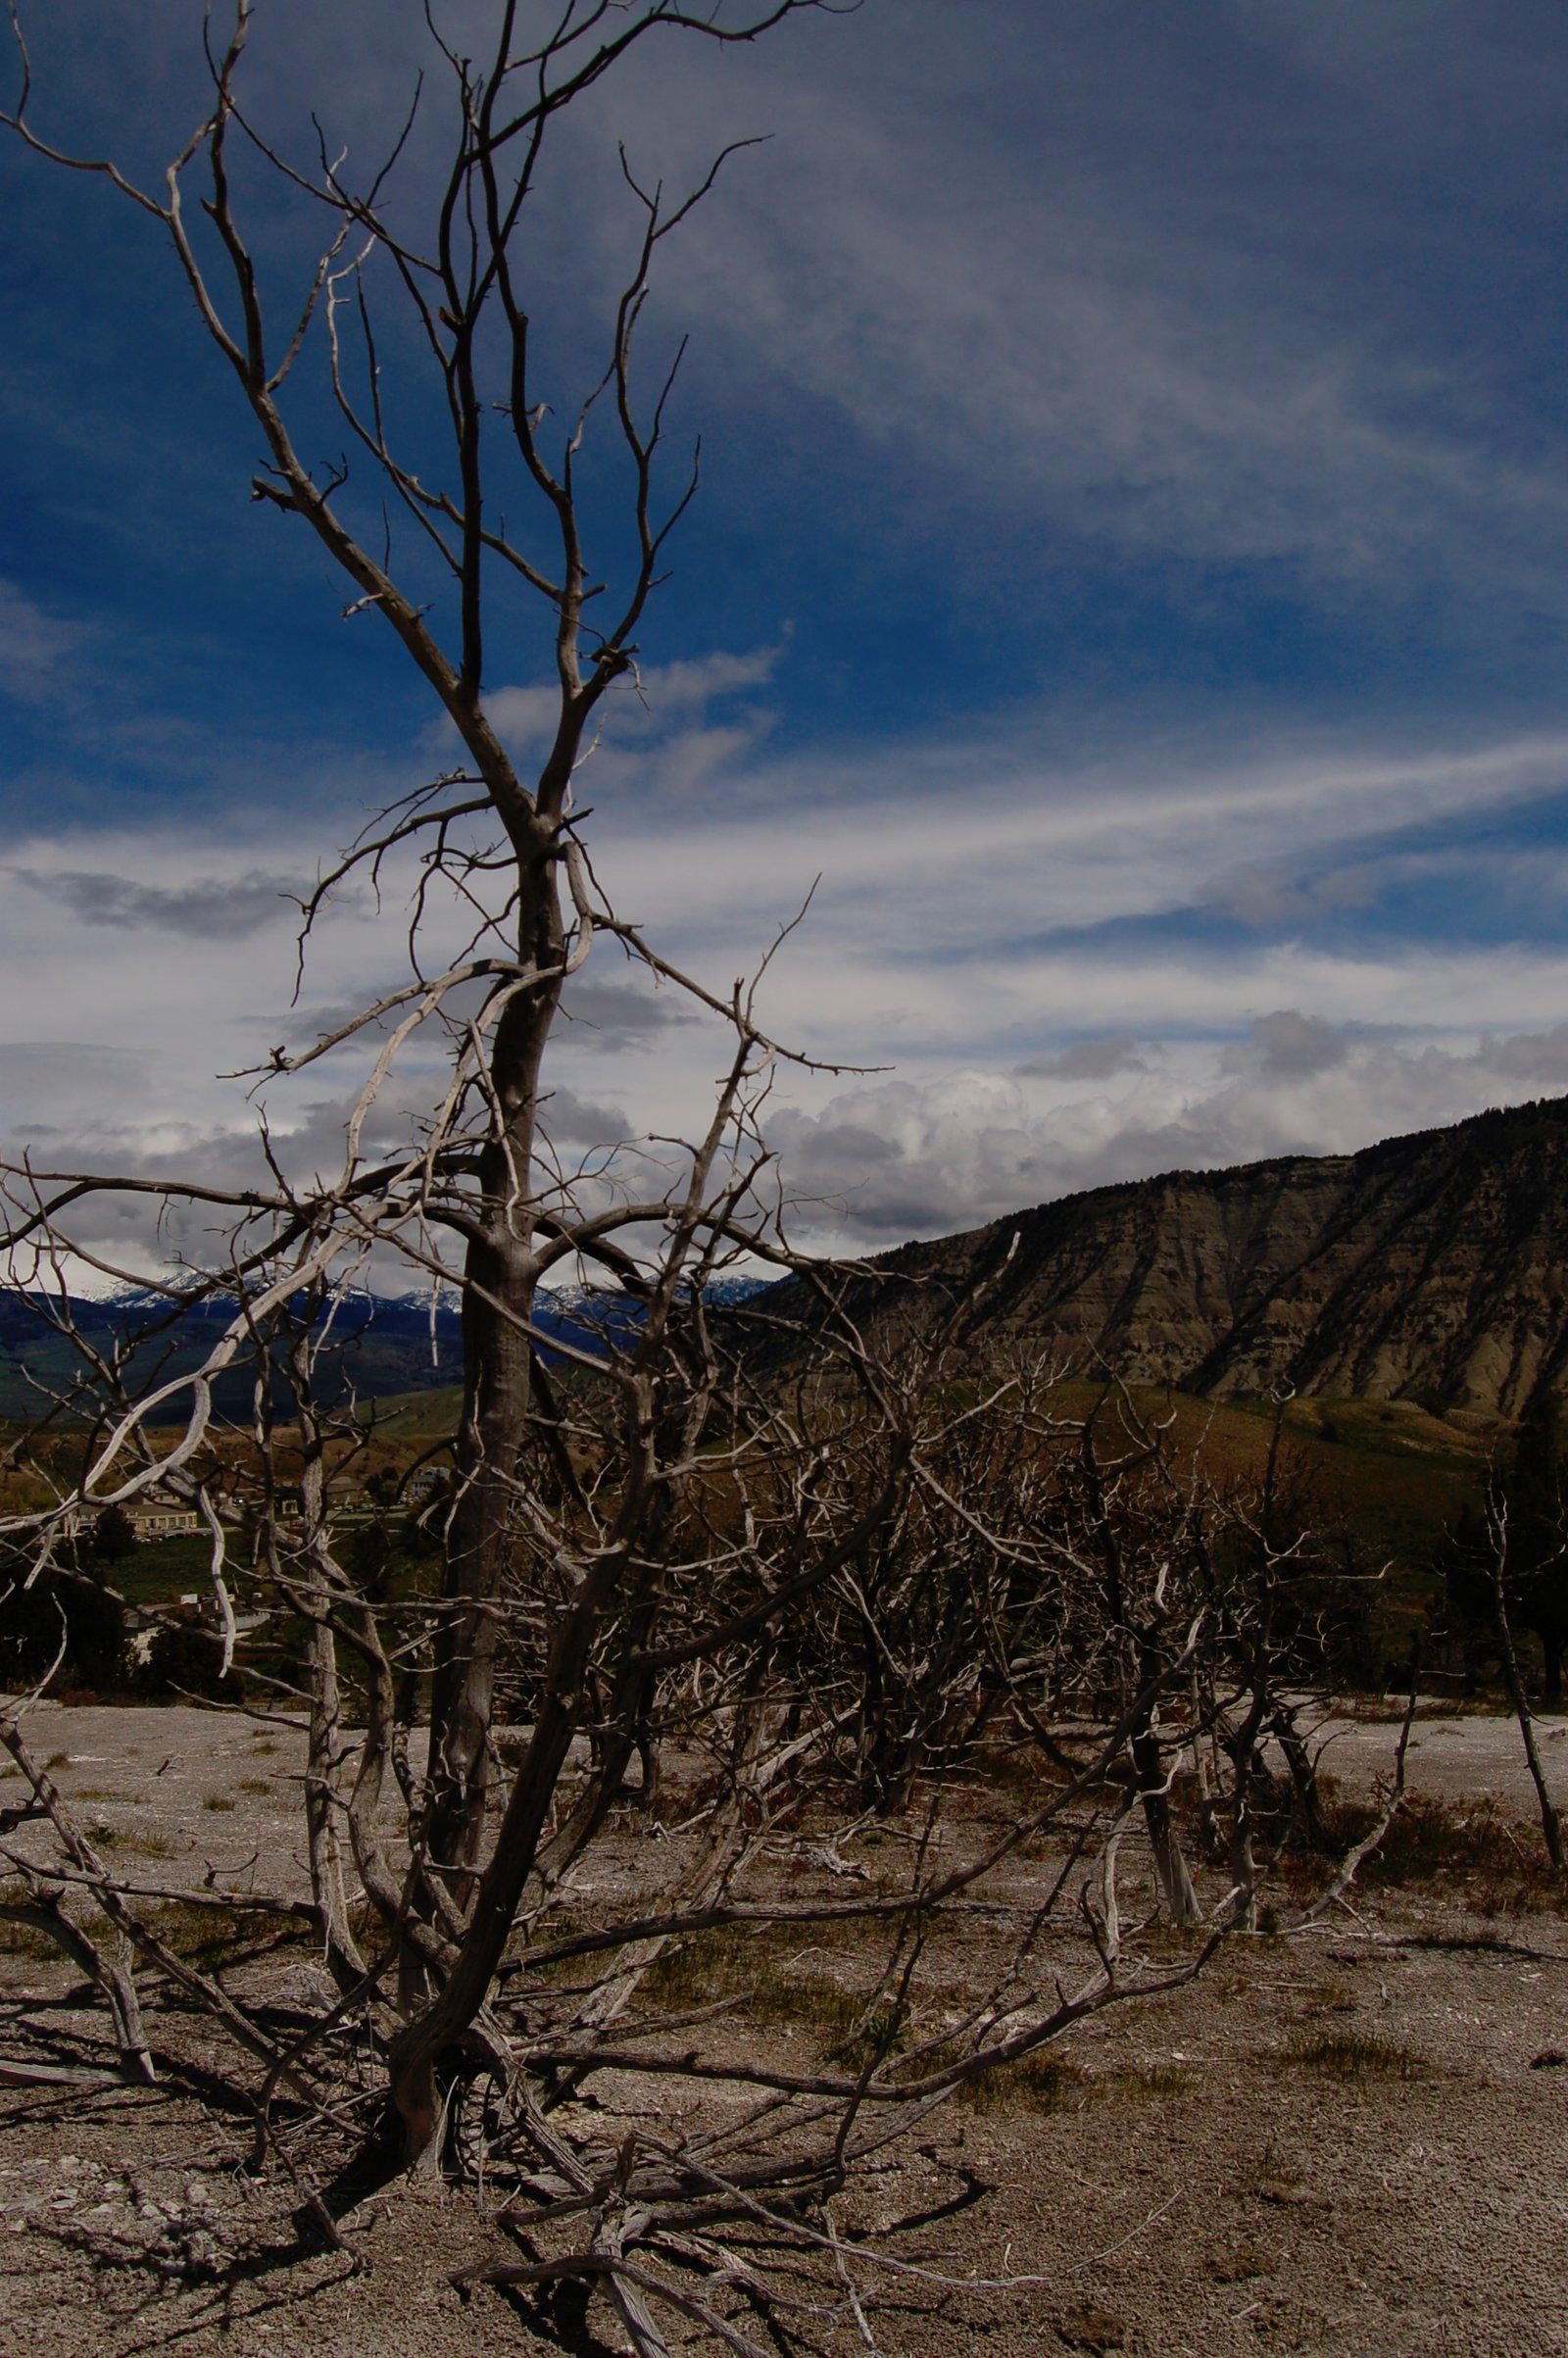 Yellowstone - 1 of 4